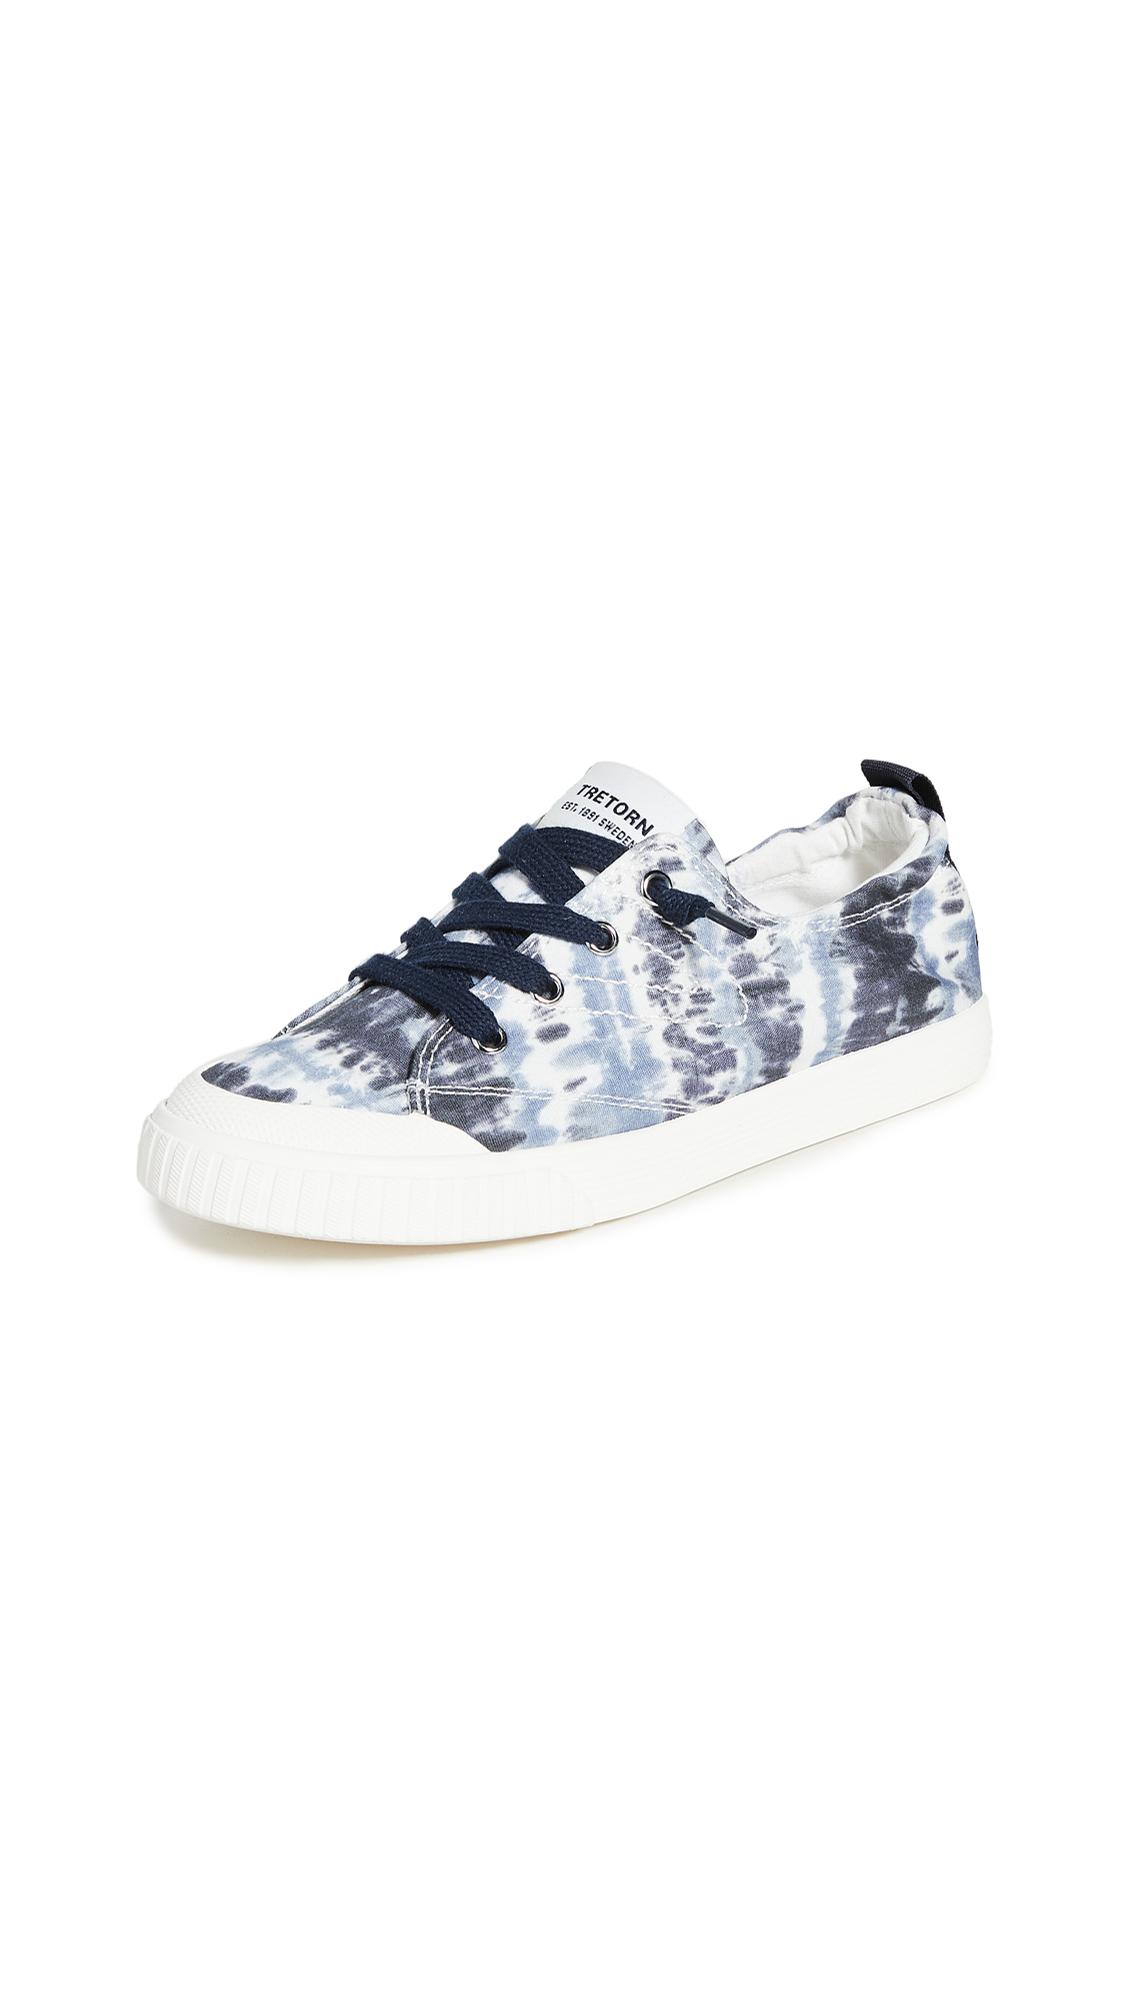 Tretorn Meg 8 Sneakers - 30% Off Sale